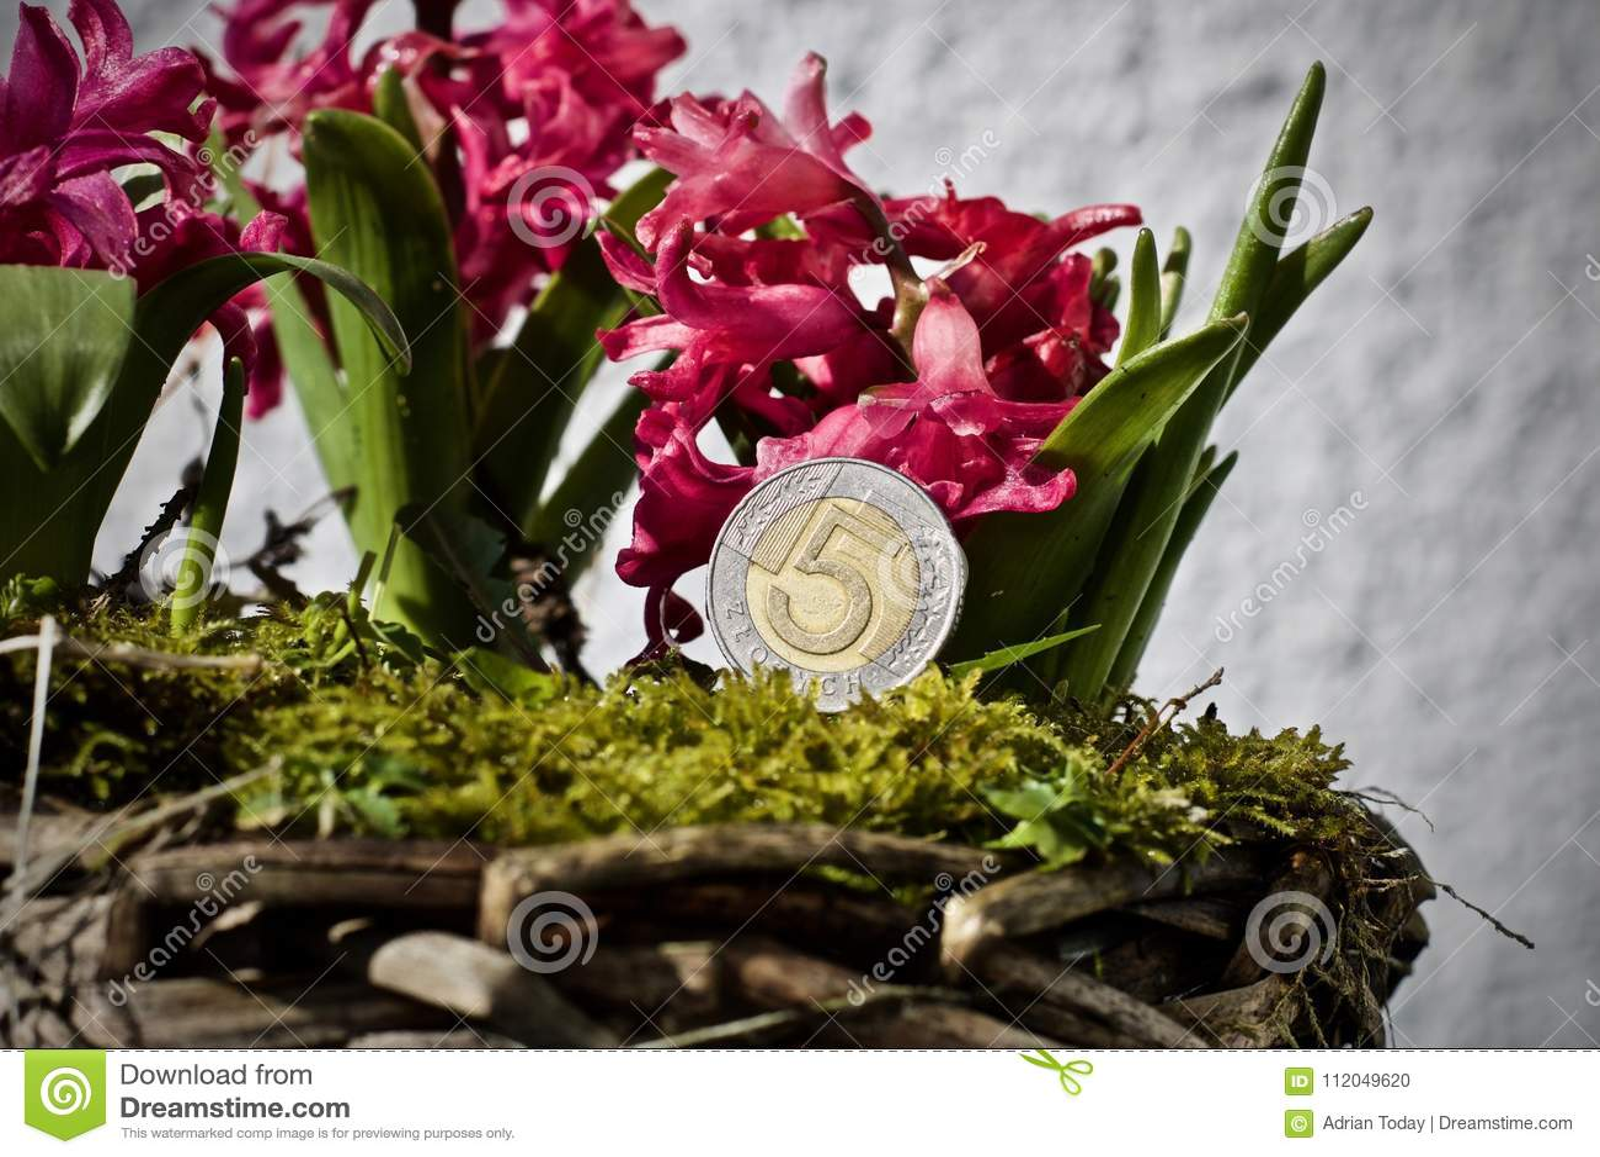 Polish money flower concept stock photo image of plant flower polish money flower concept izmirmasajfo